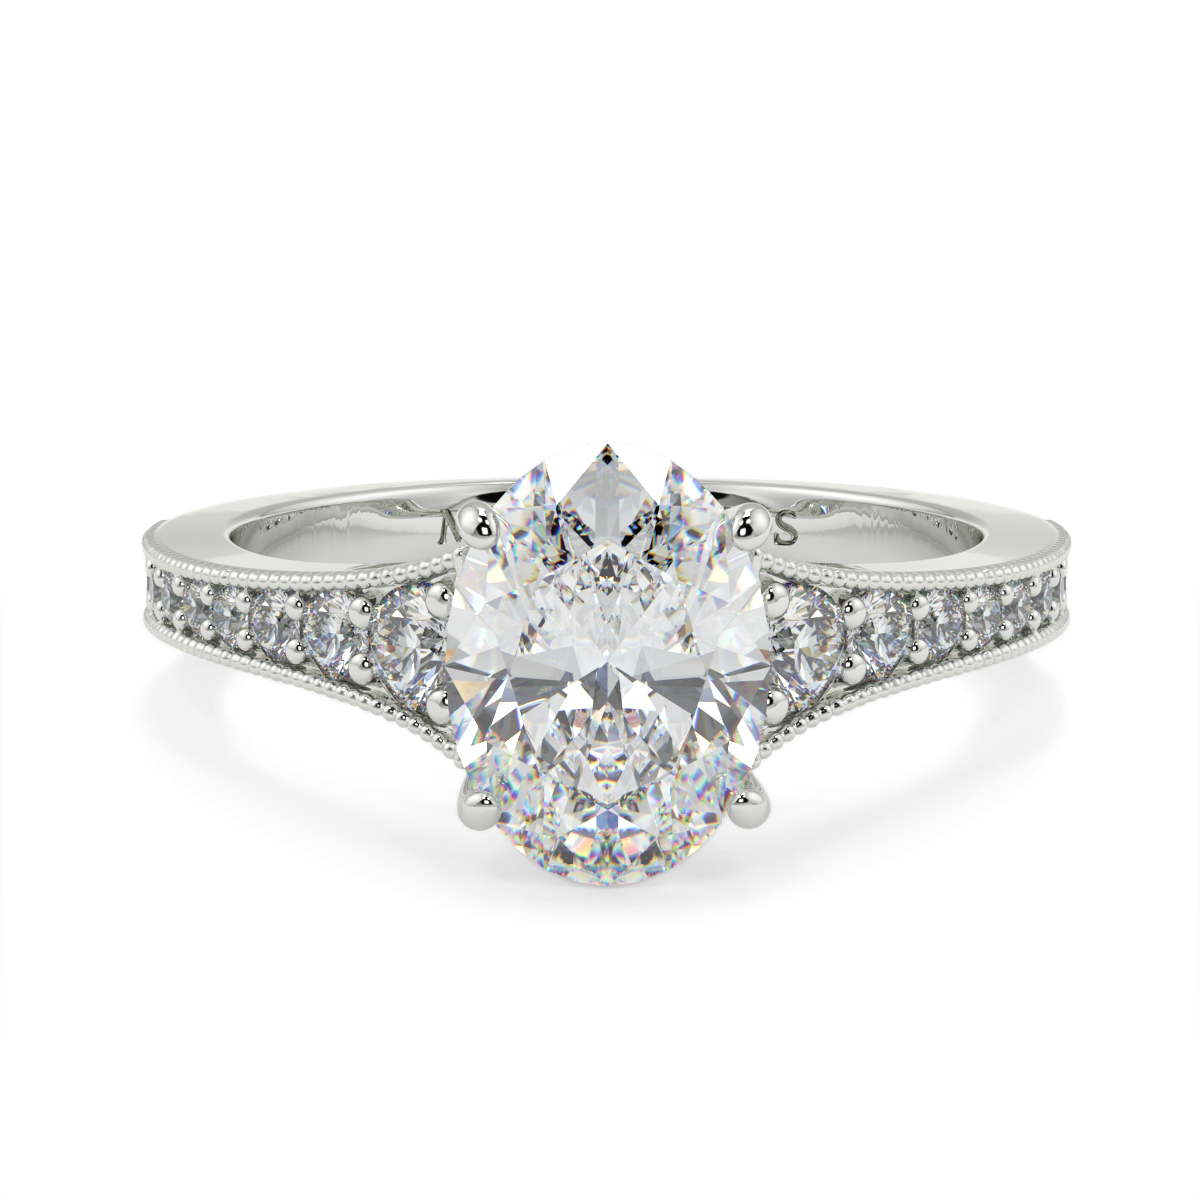 Oval Pave Grain Set Diamond Ring